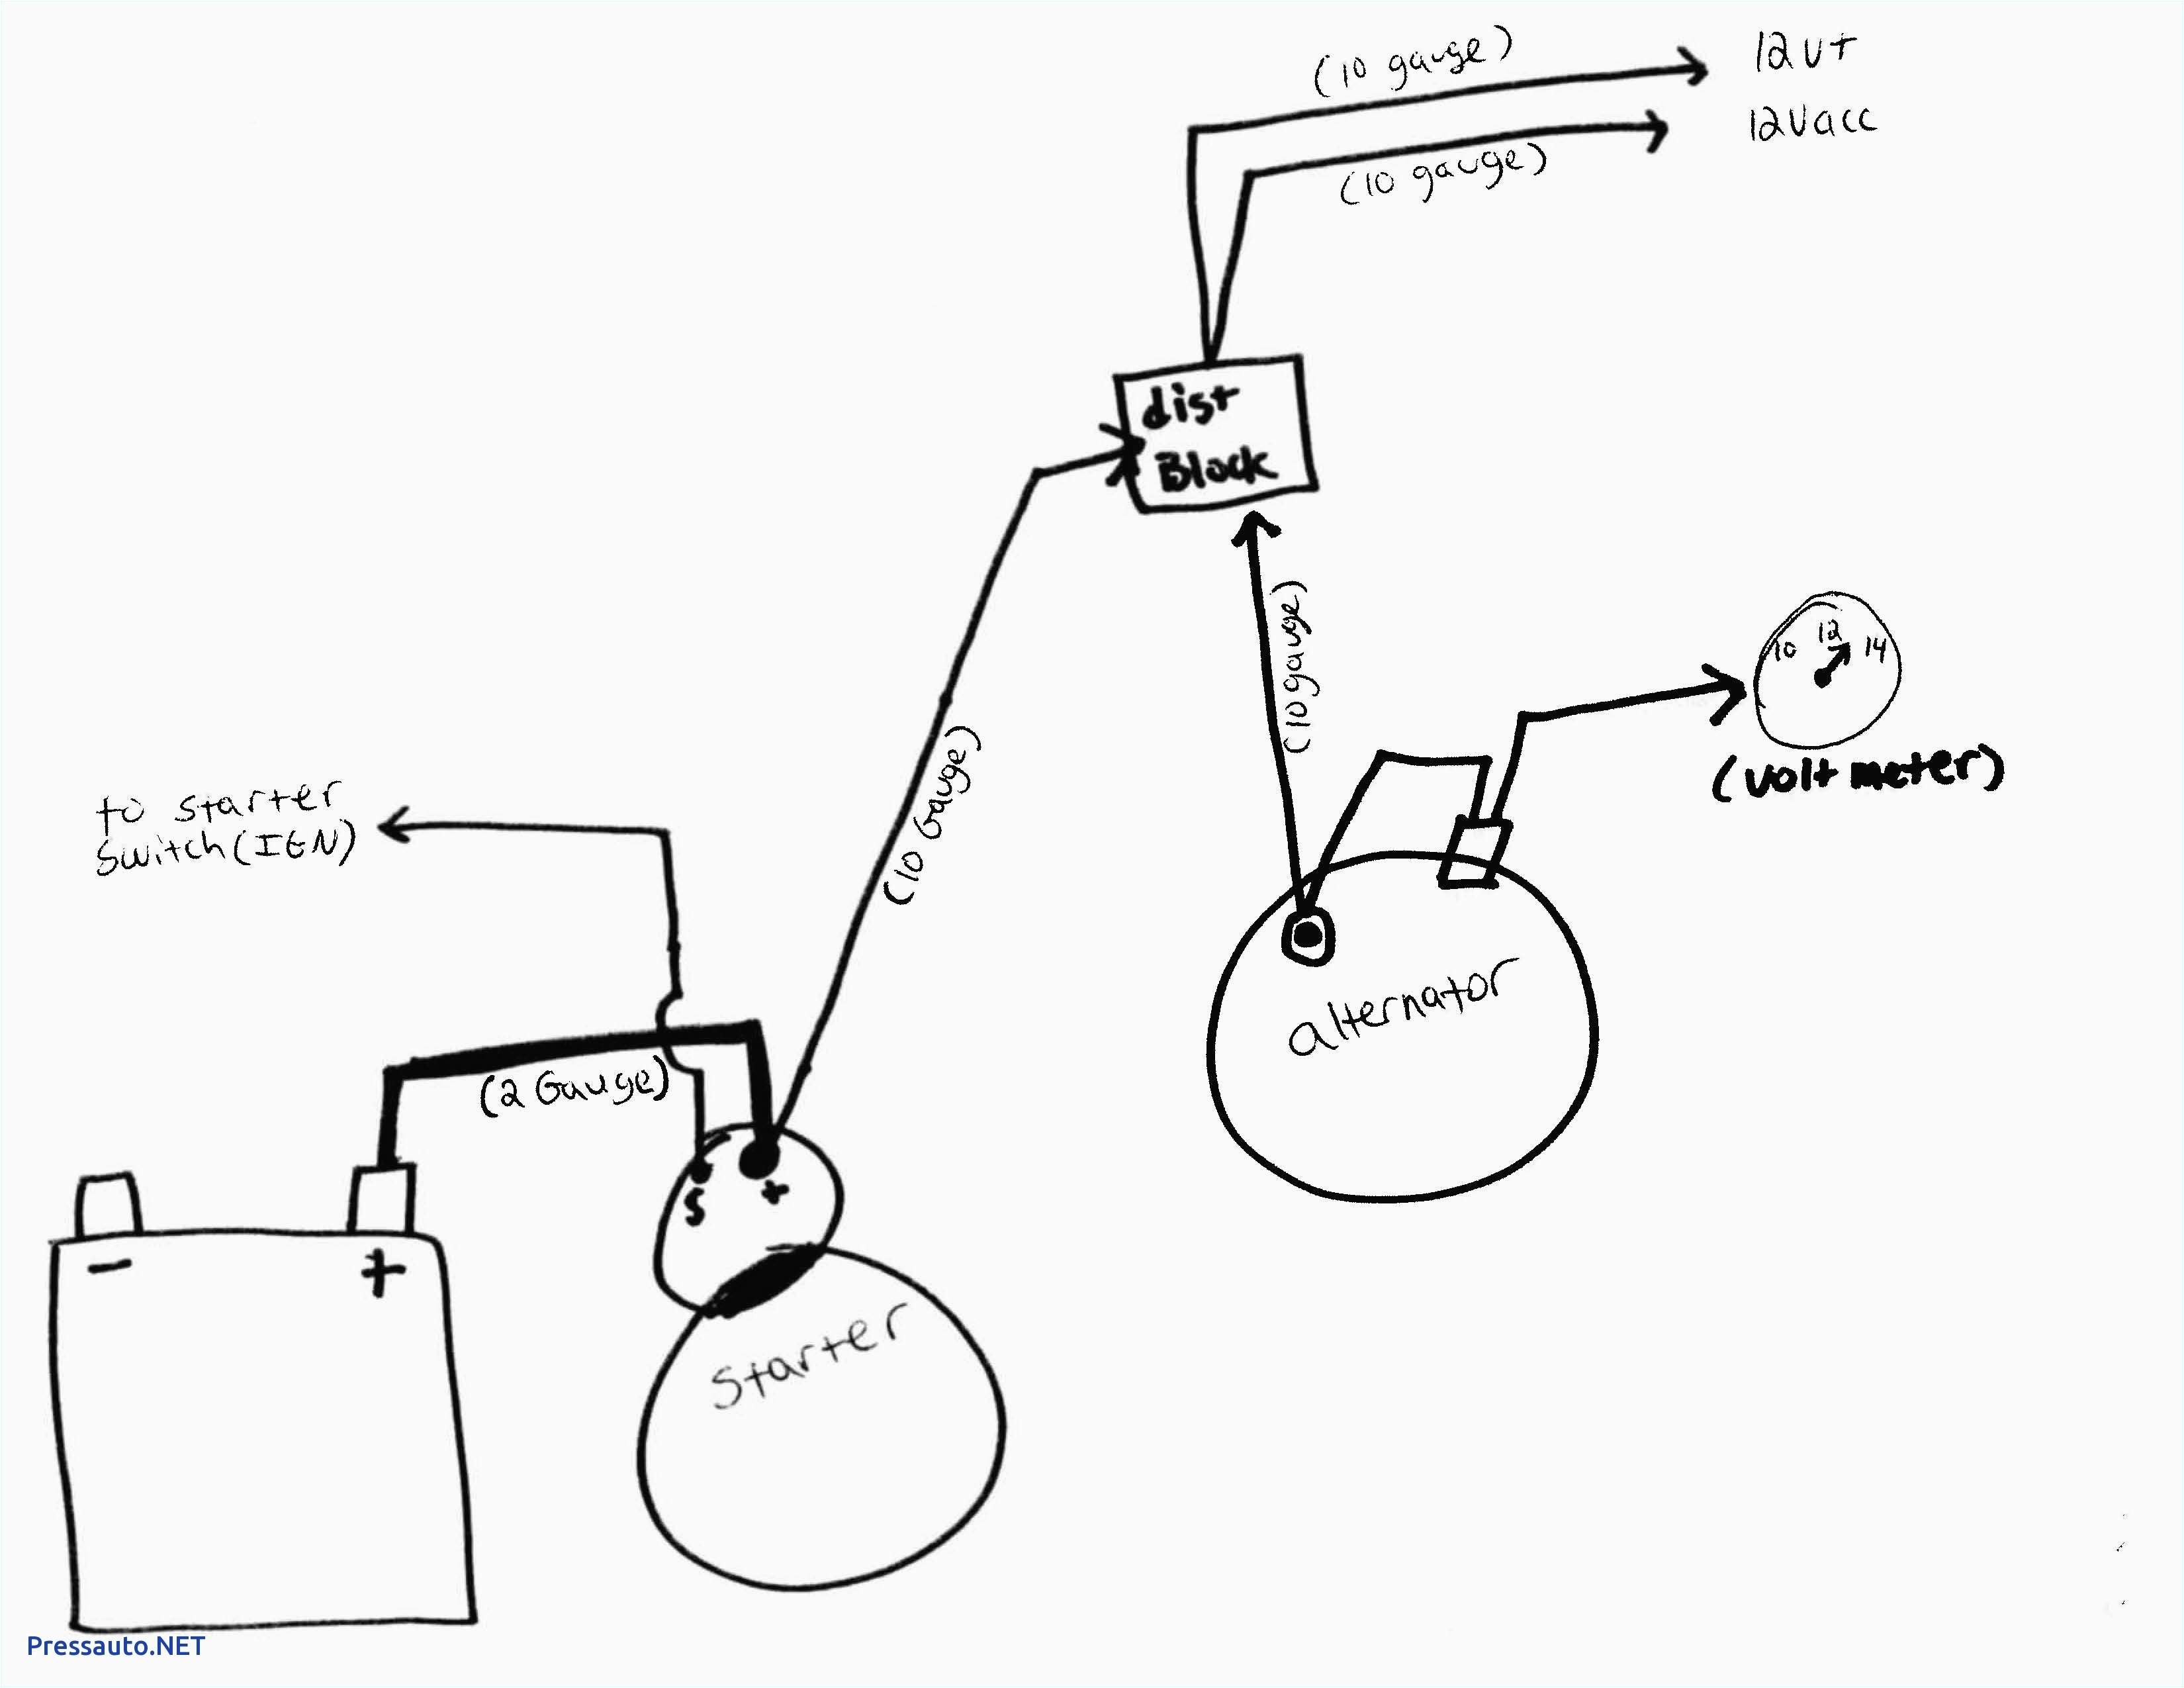 ford 351 alternator wiring diagram wiring diagram datasource 351 ford marine alternator wiring diagram